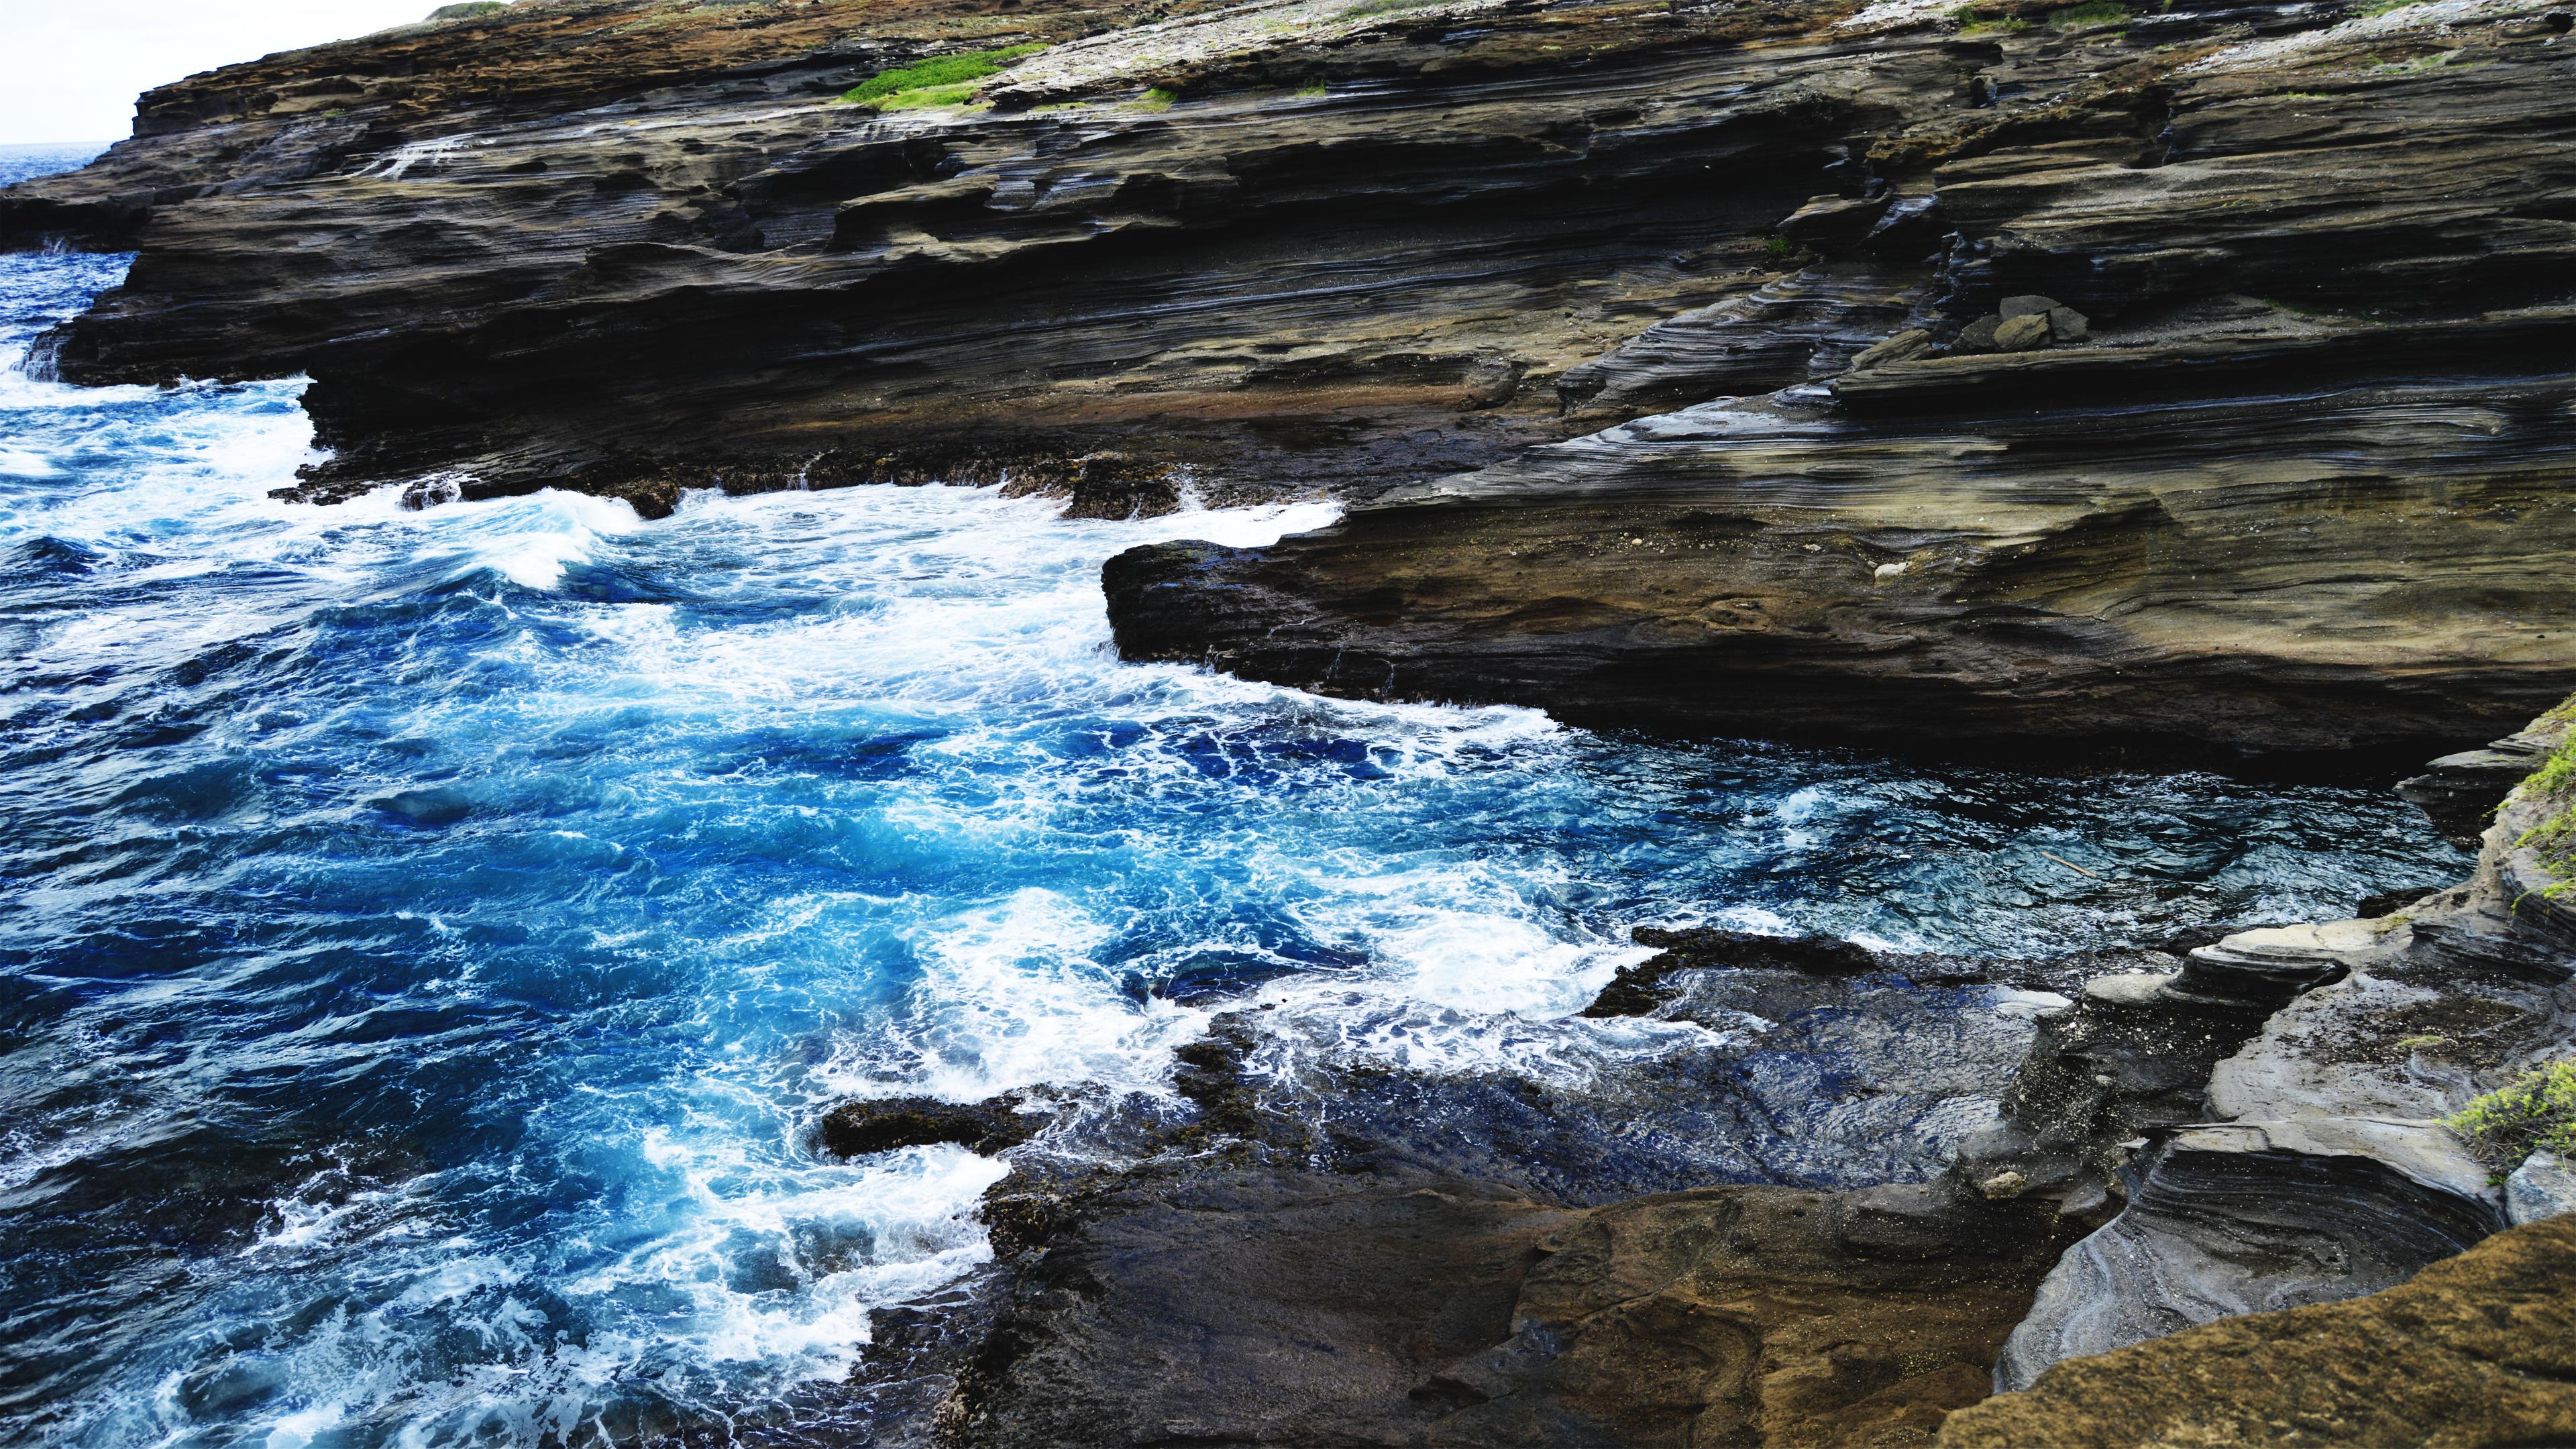 OC] Watching the waves dance in Hawaii Kai Hawaii Made a 4K 3840x2160